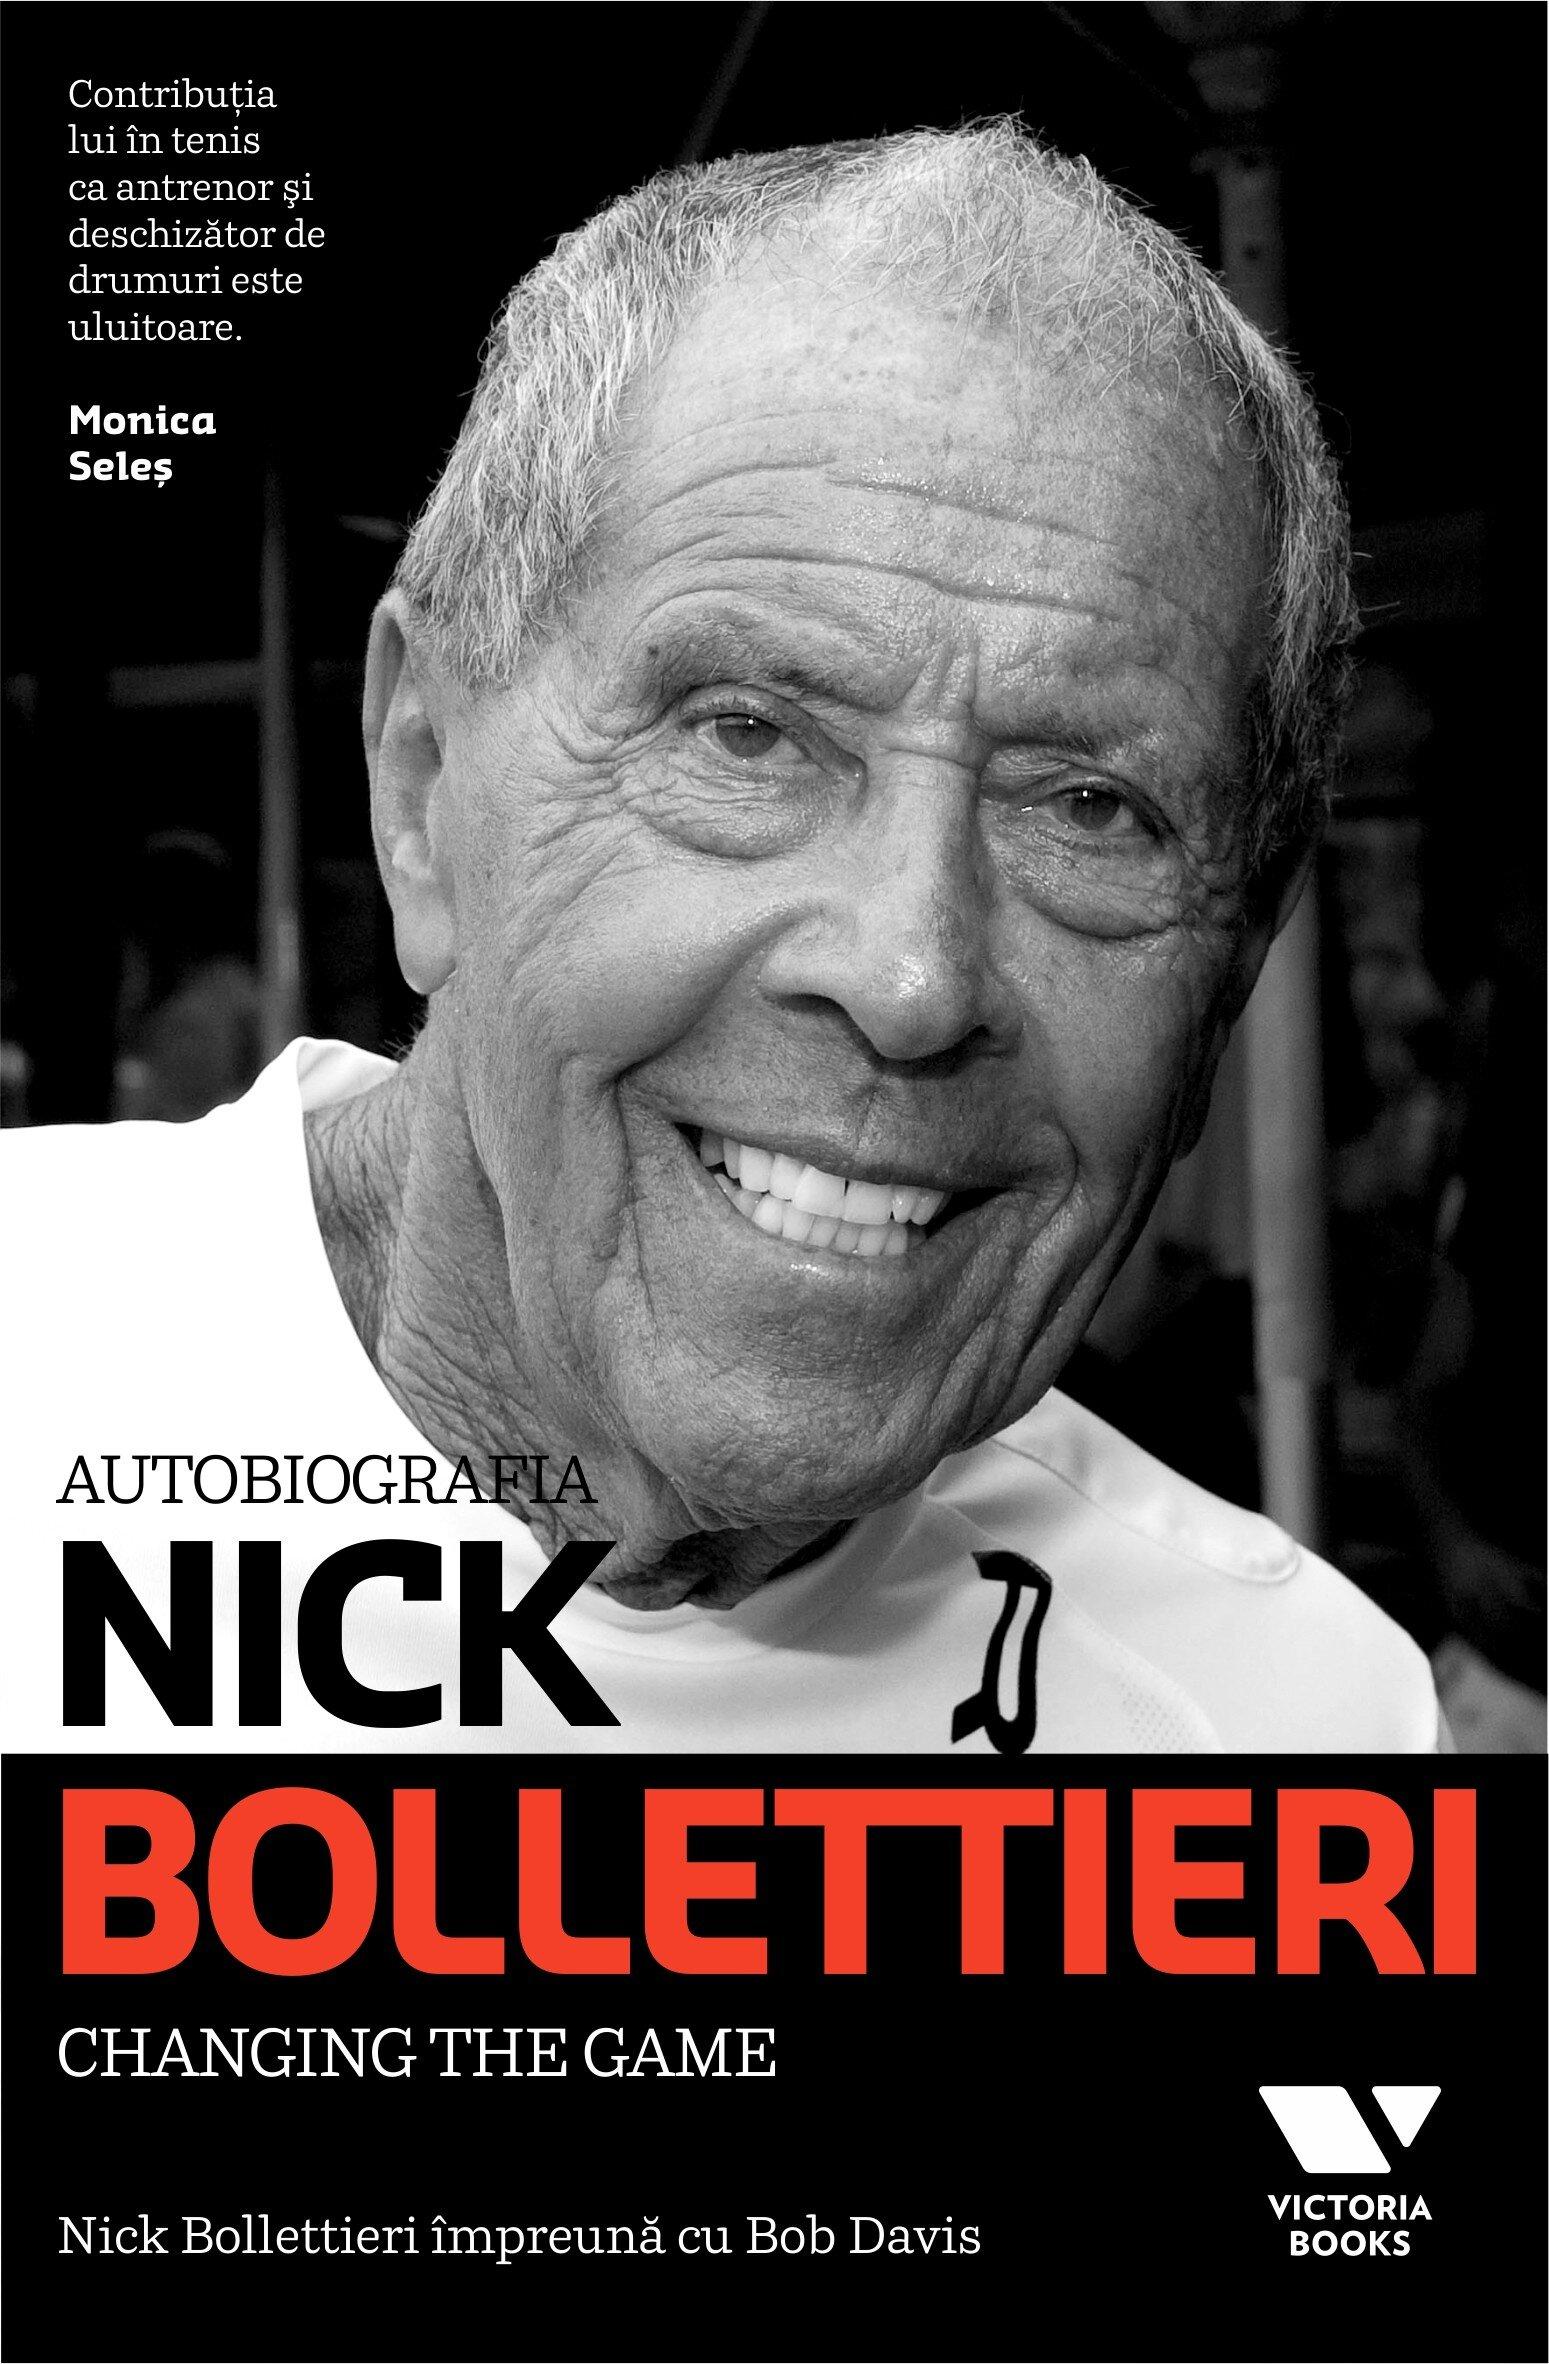 Autobiografia Nick Bollettieri. Changing the game